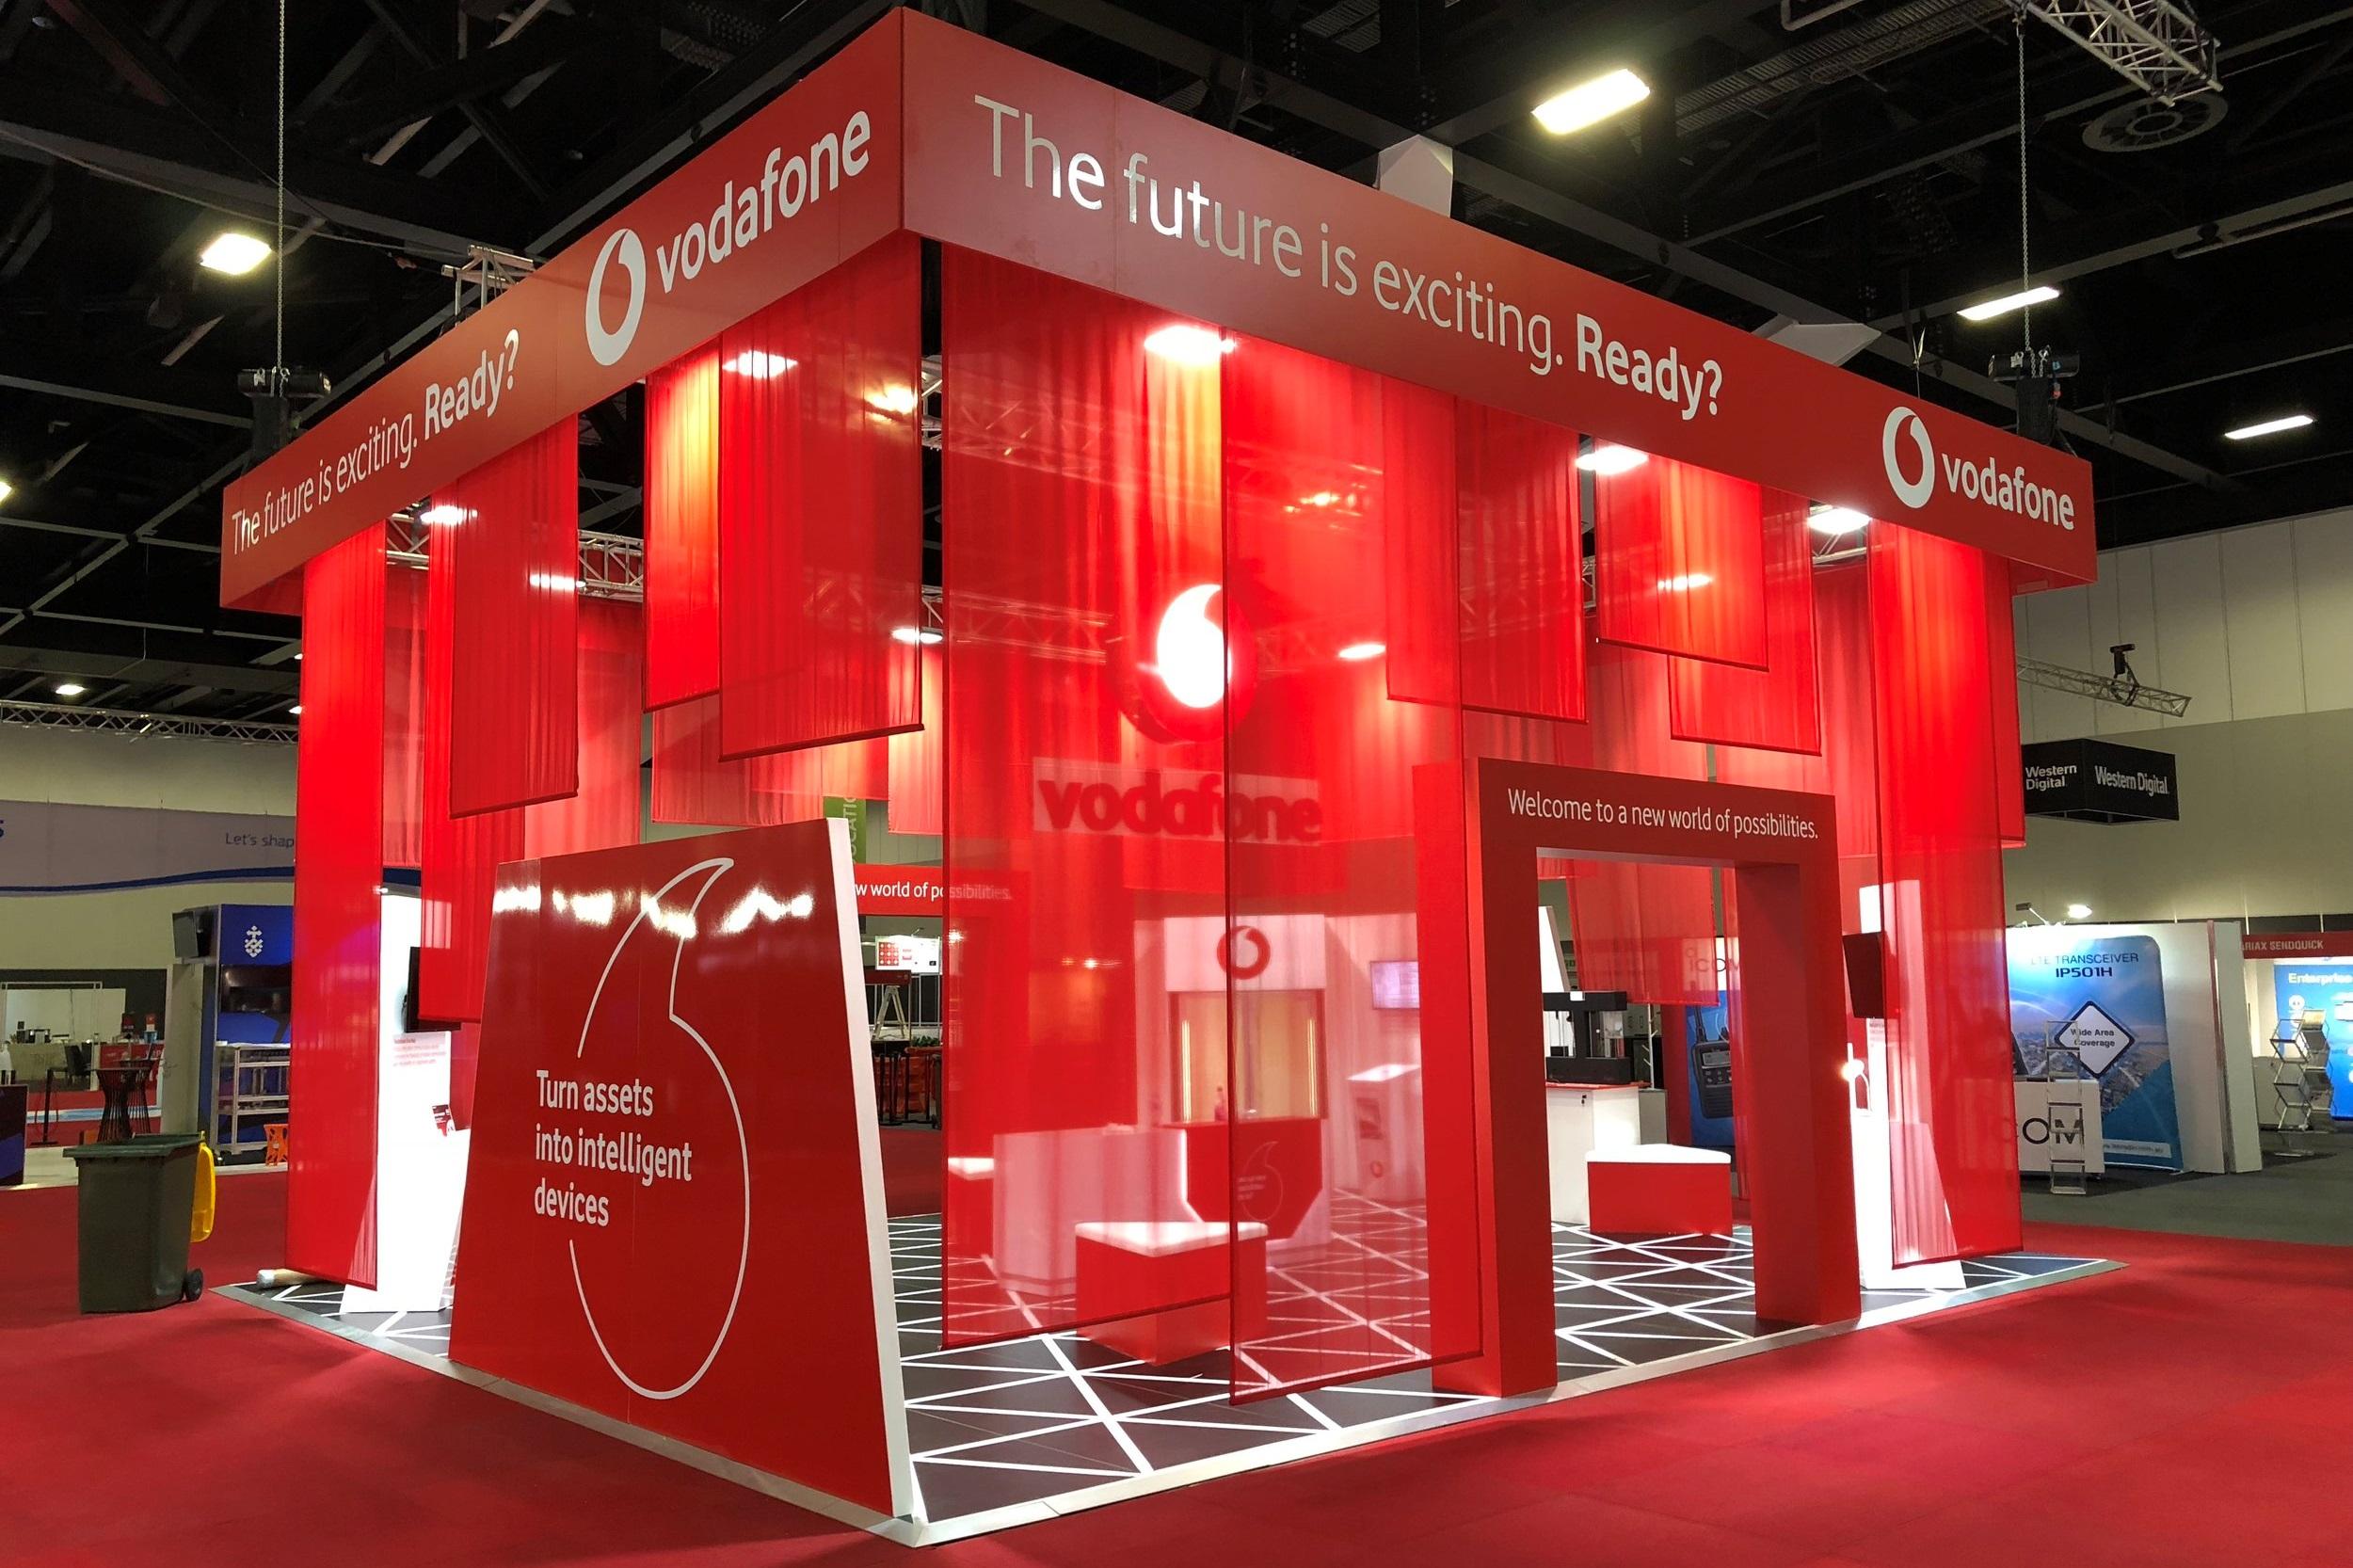 Vodafone at CEBIT, 2018